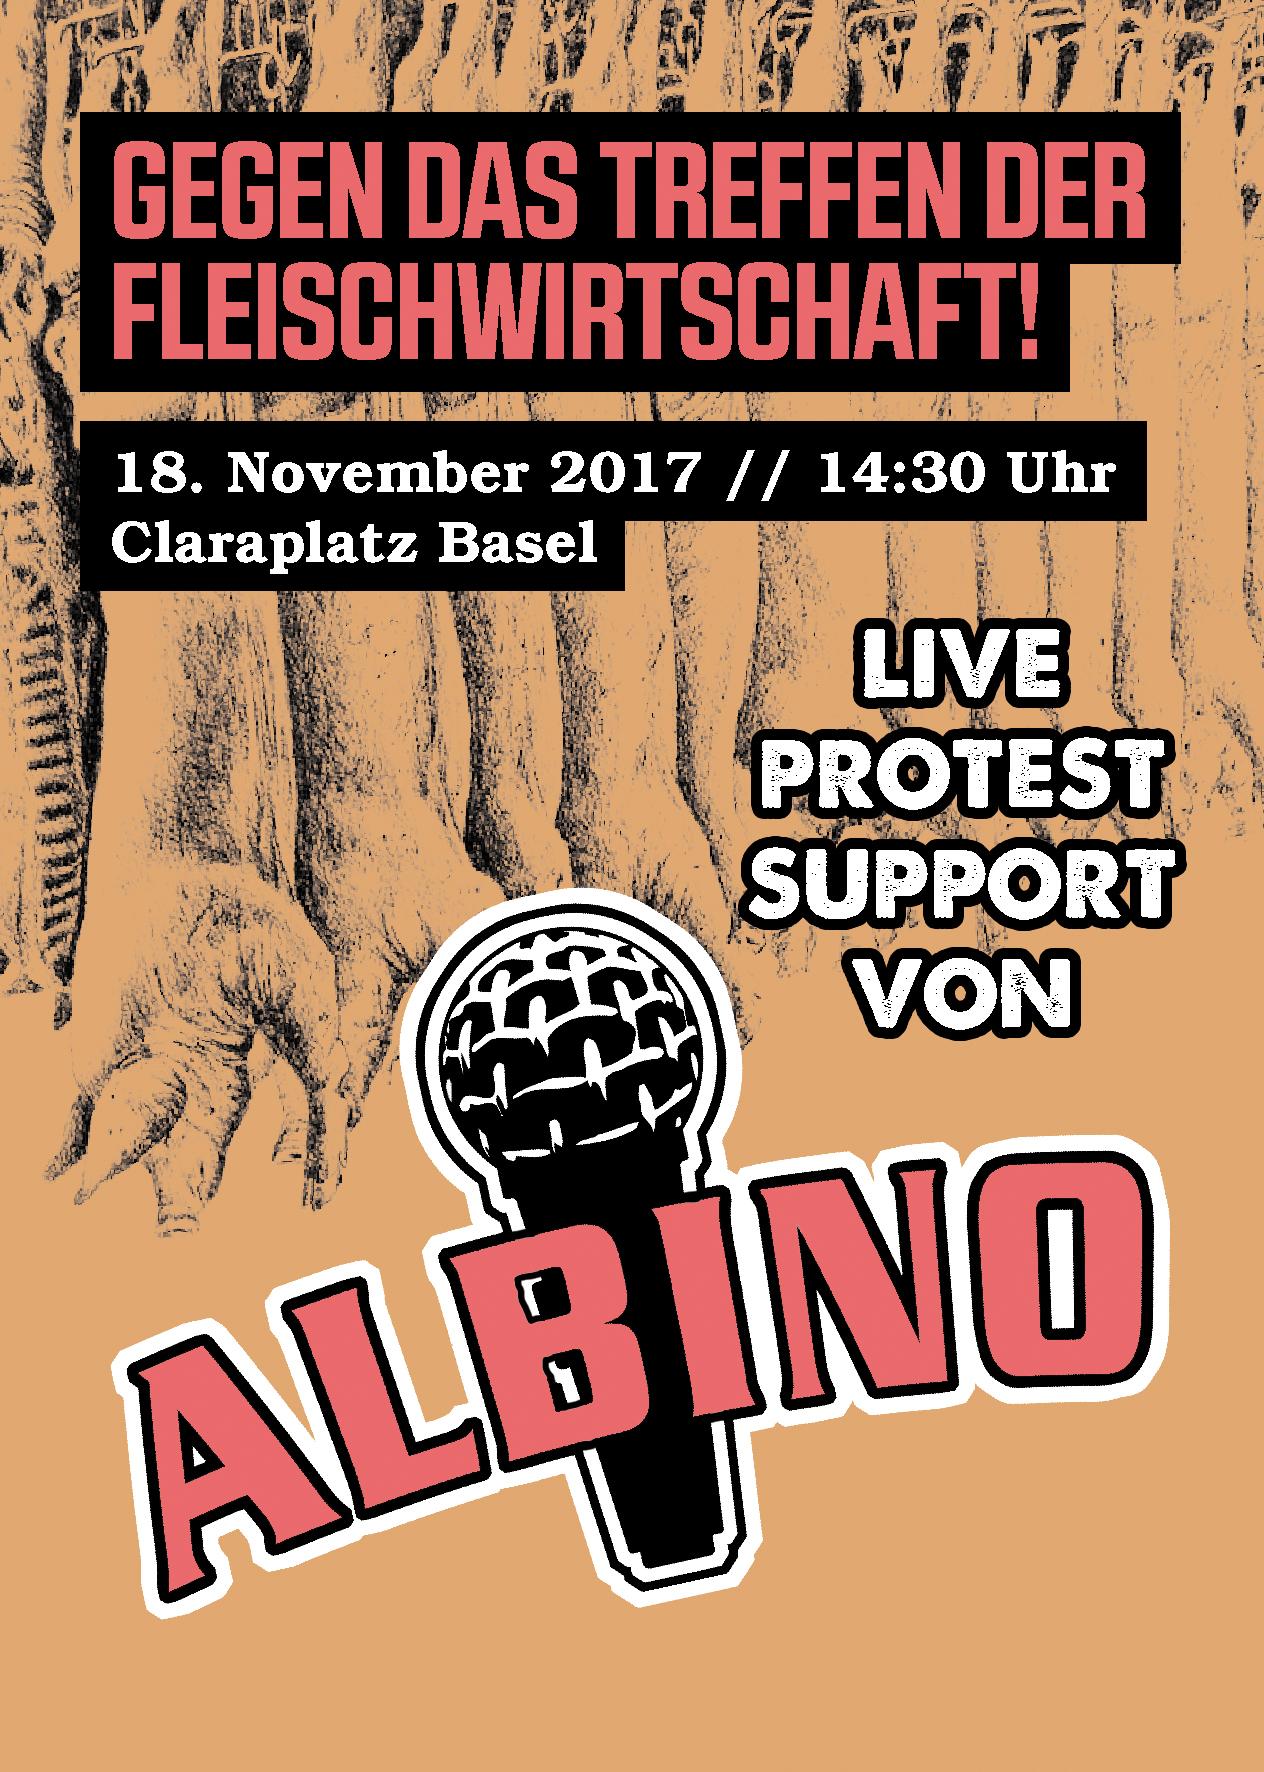 MC Albino Protest gegen Mefa 2017 Basel